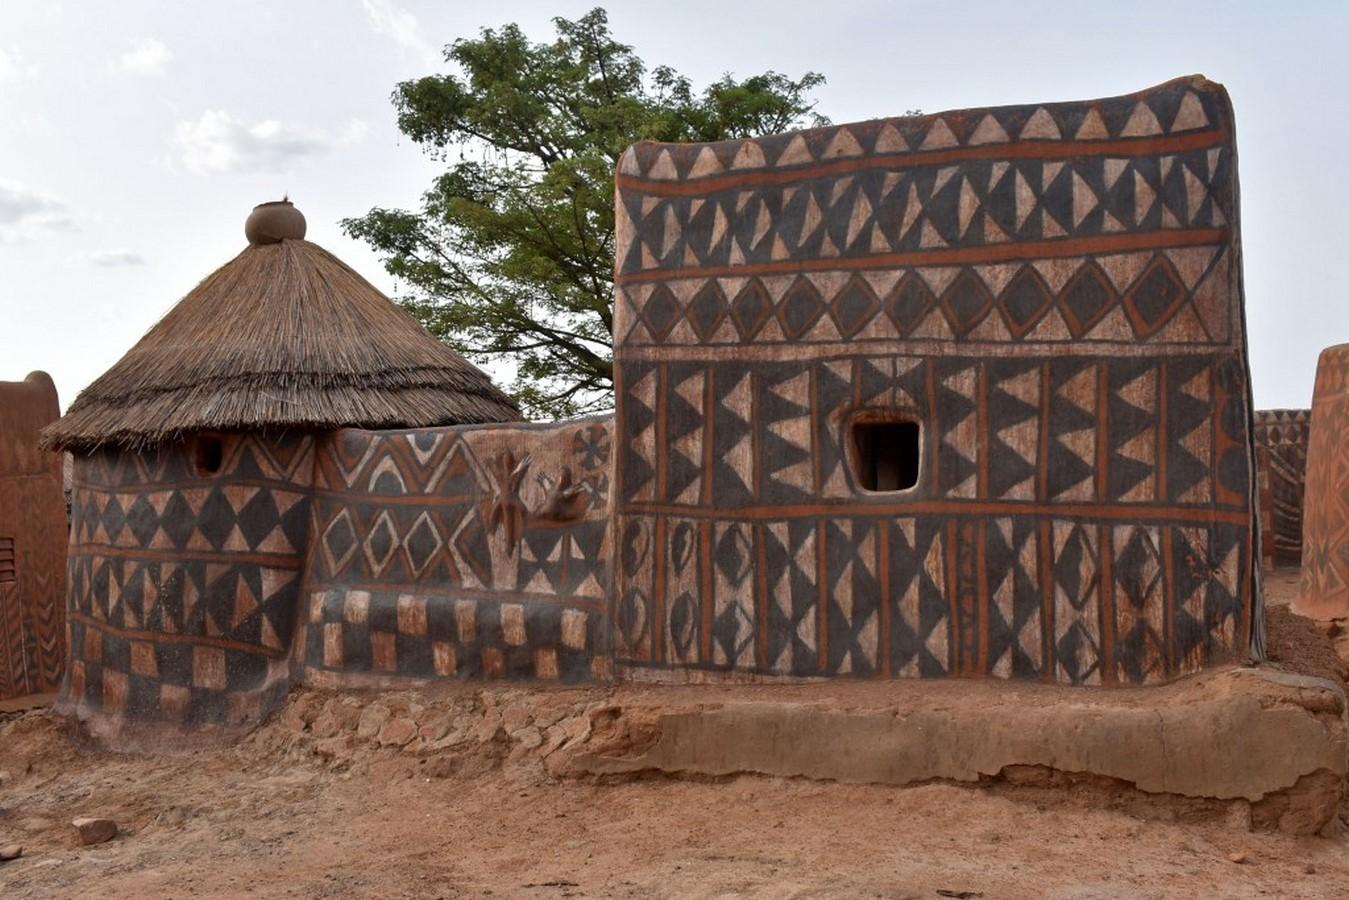 Characteristics of Sudano-Sahelian architecture - Sheet7